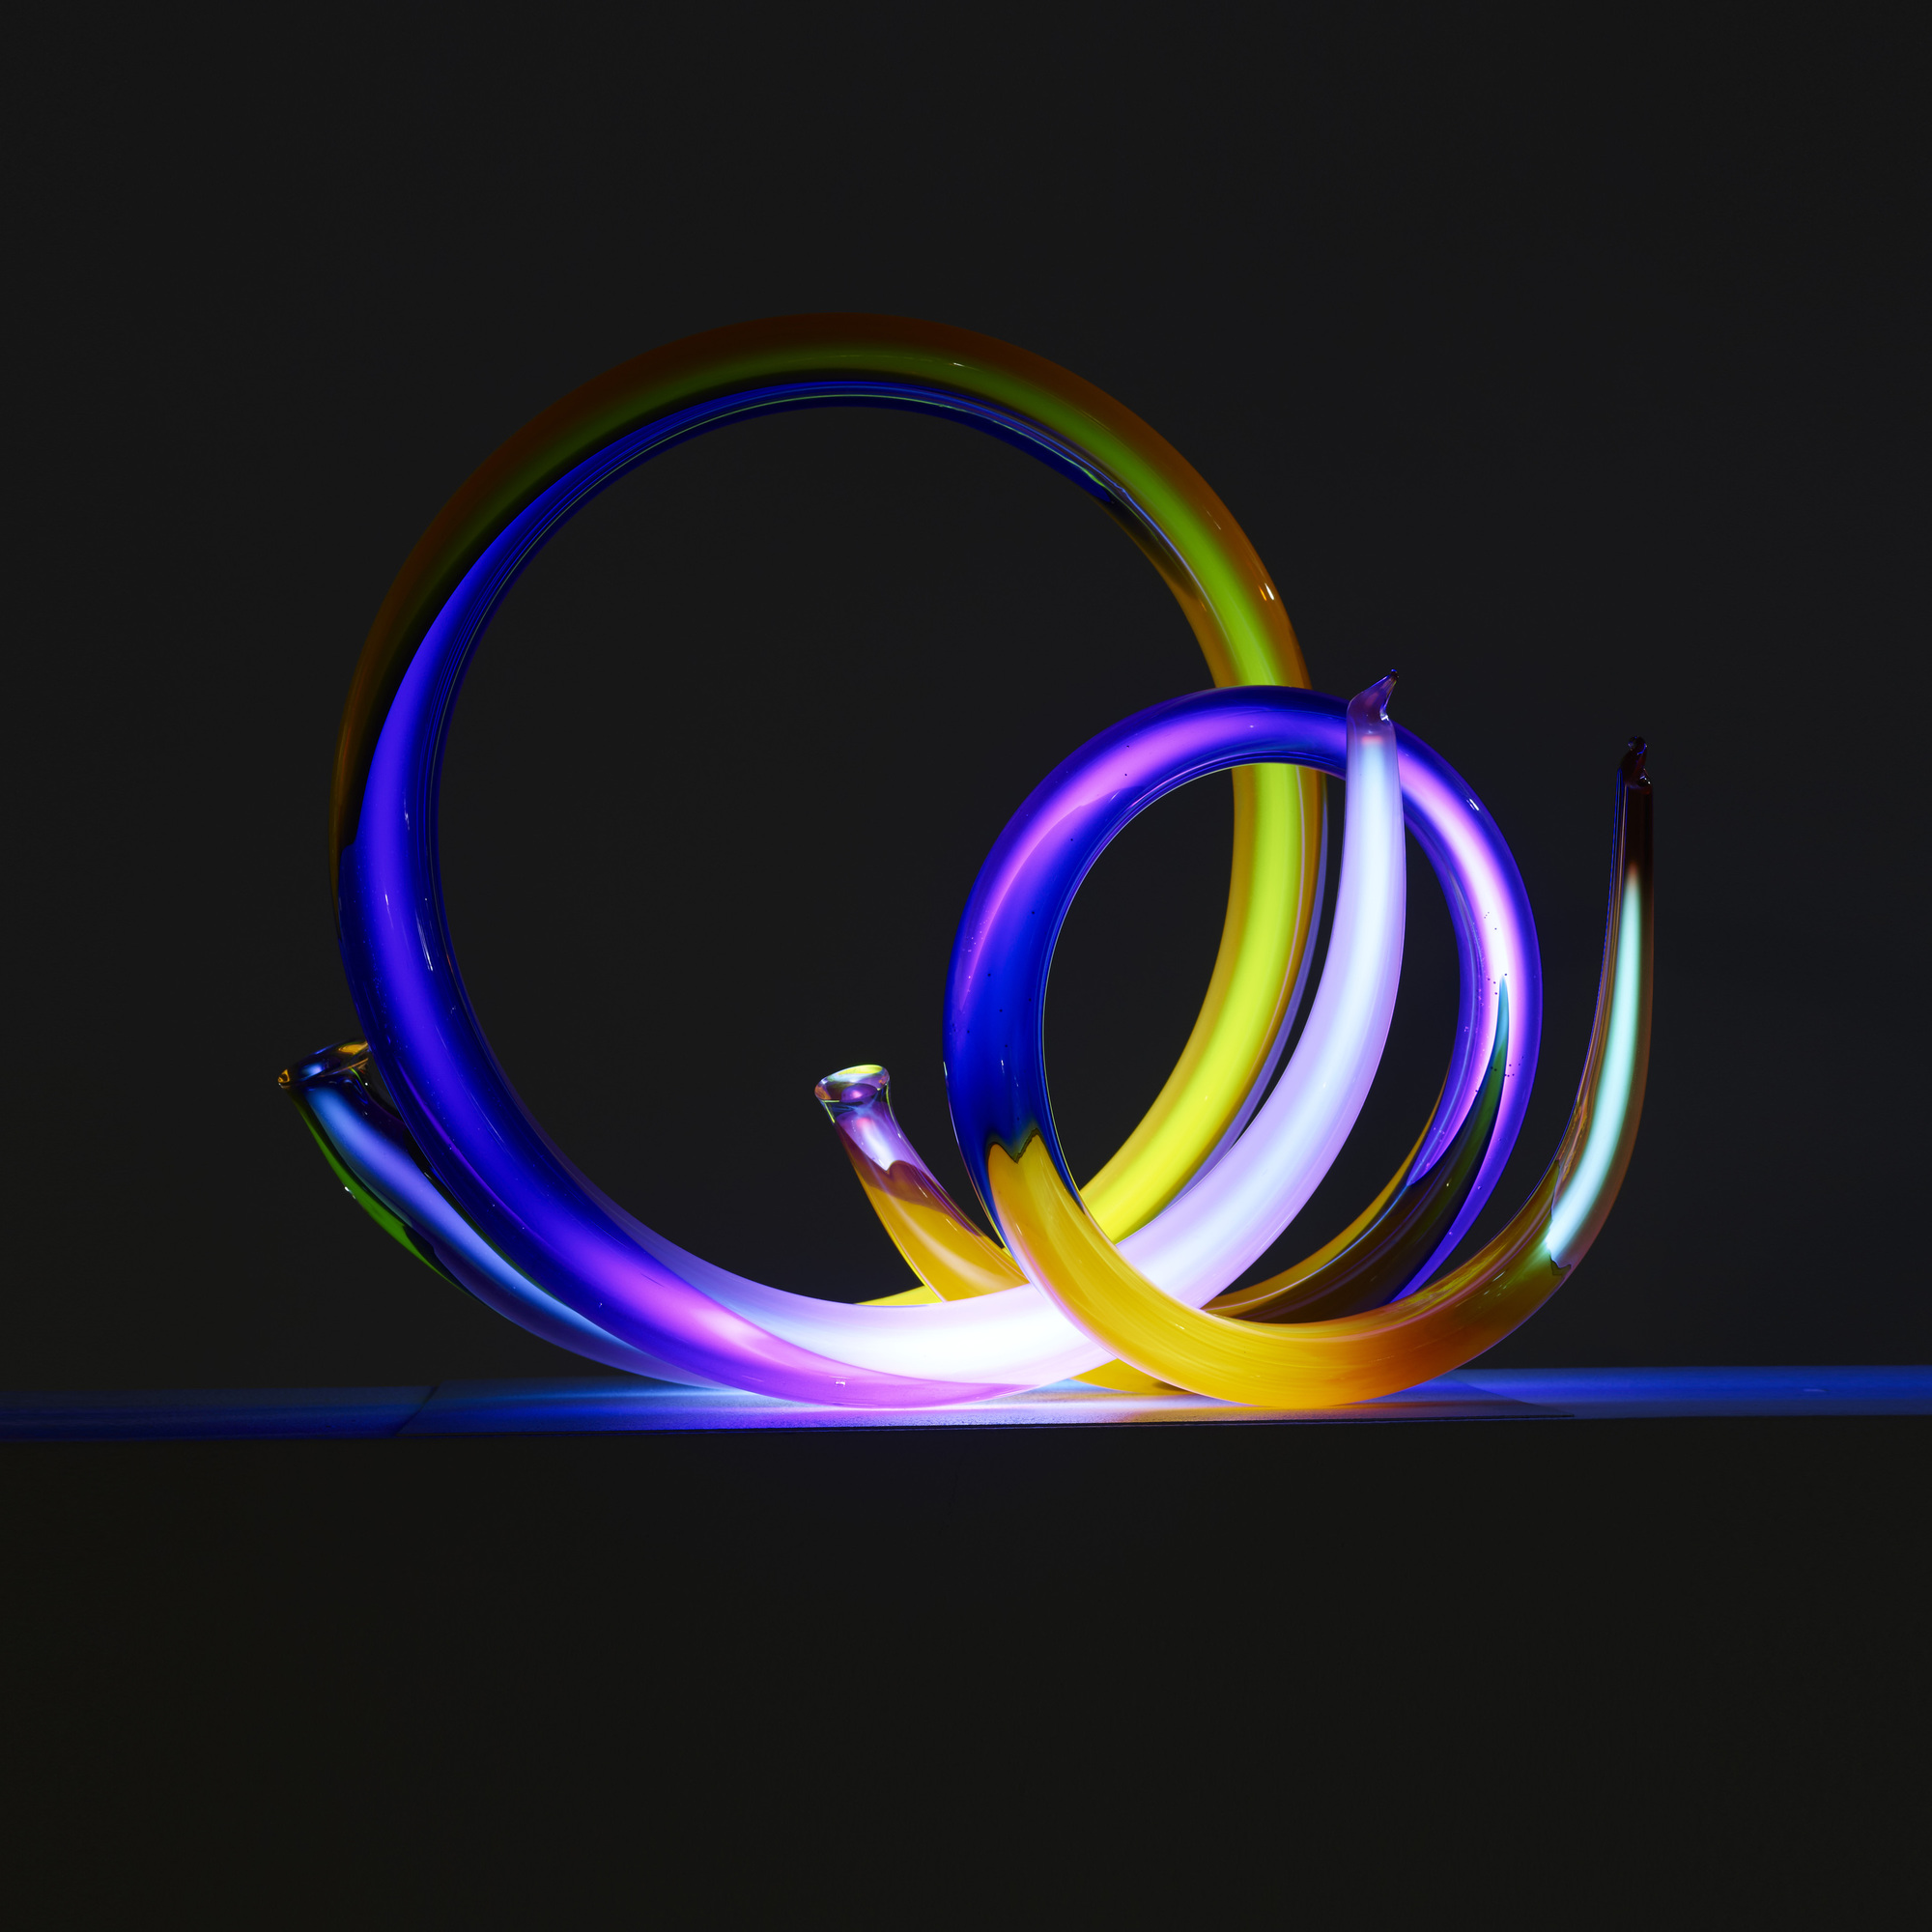 147: Paul Seide / Spiral Neon (4 of 4)